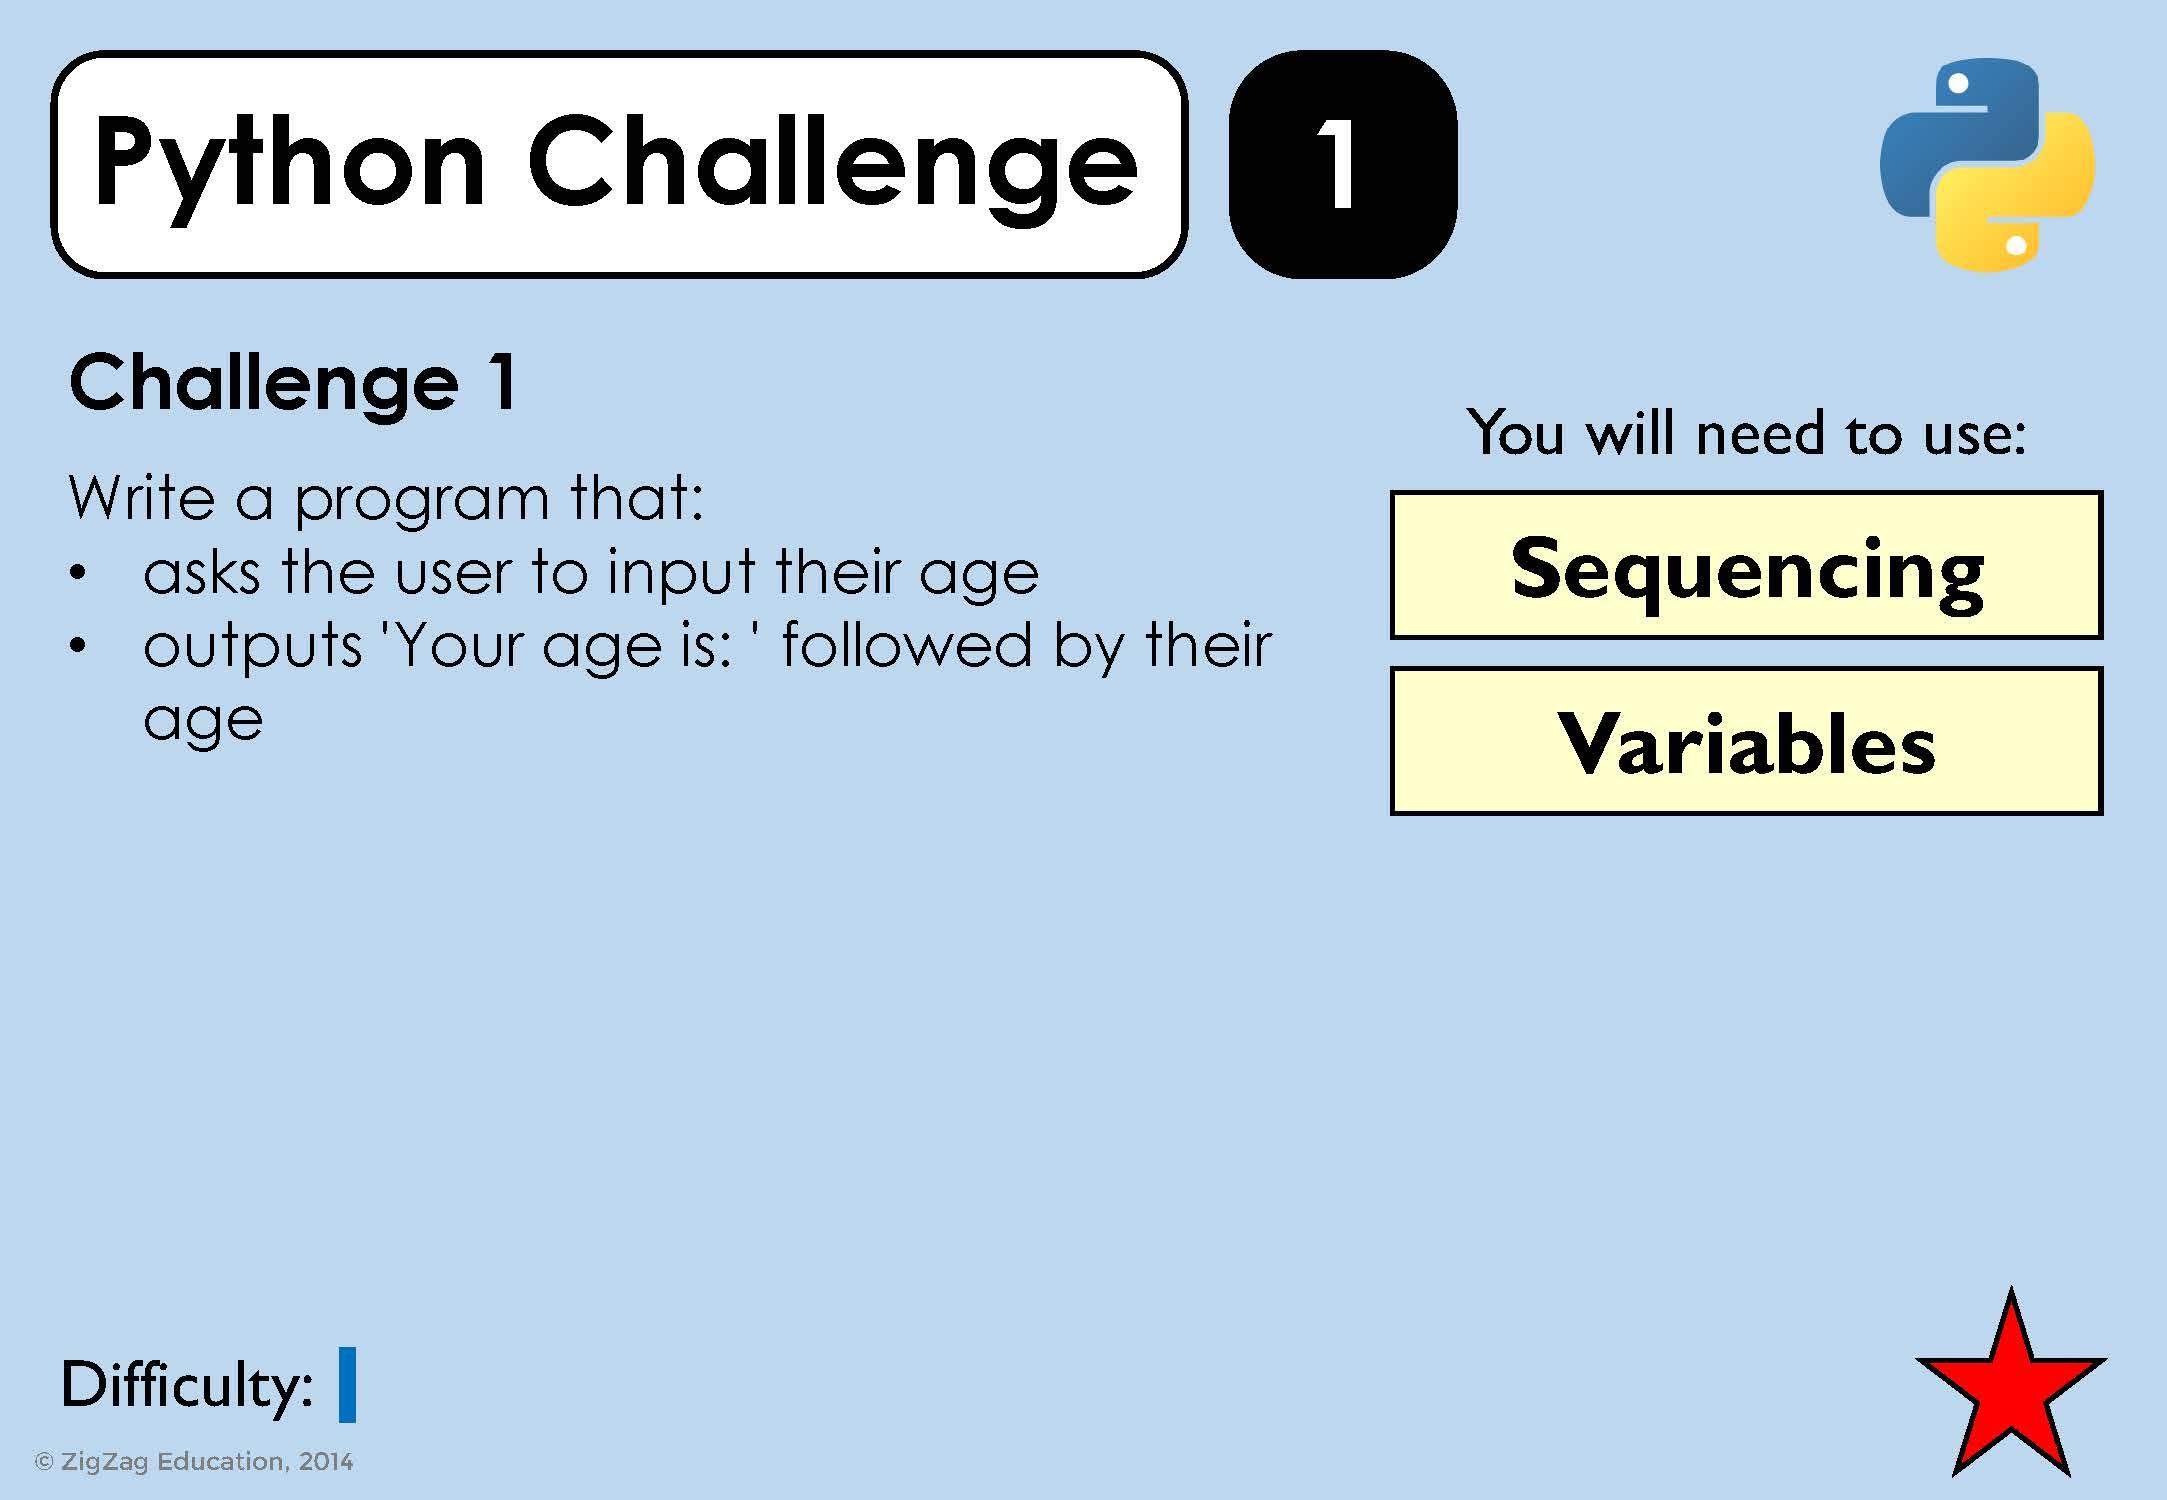 Python Challenges for KS3/4